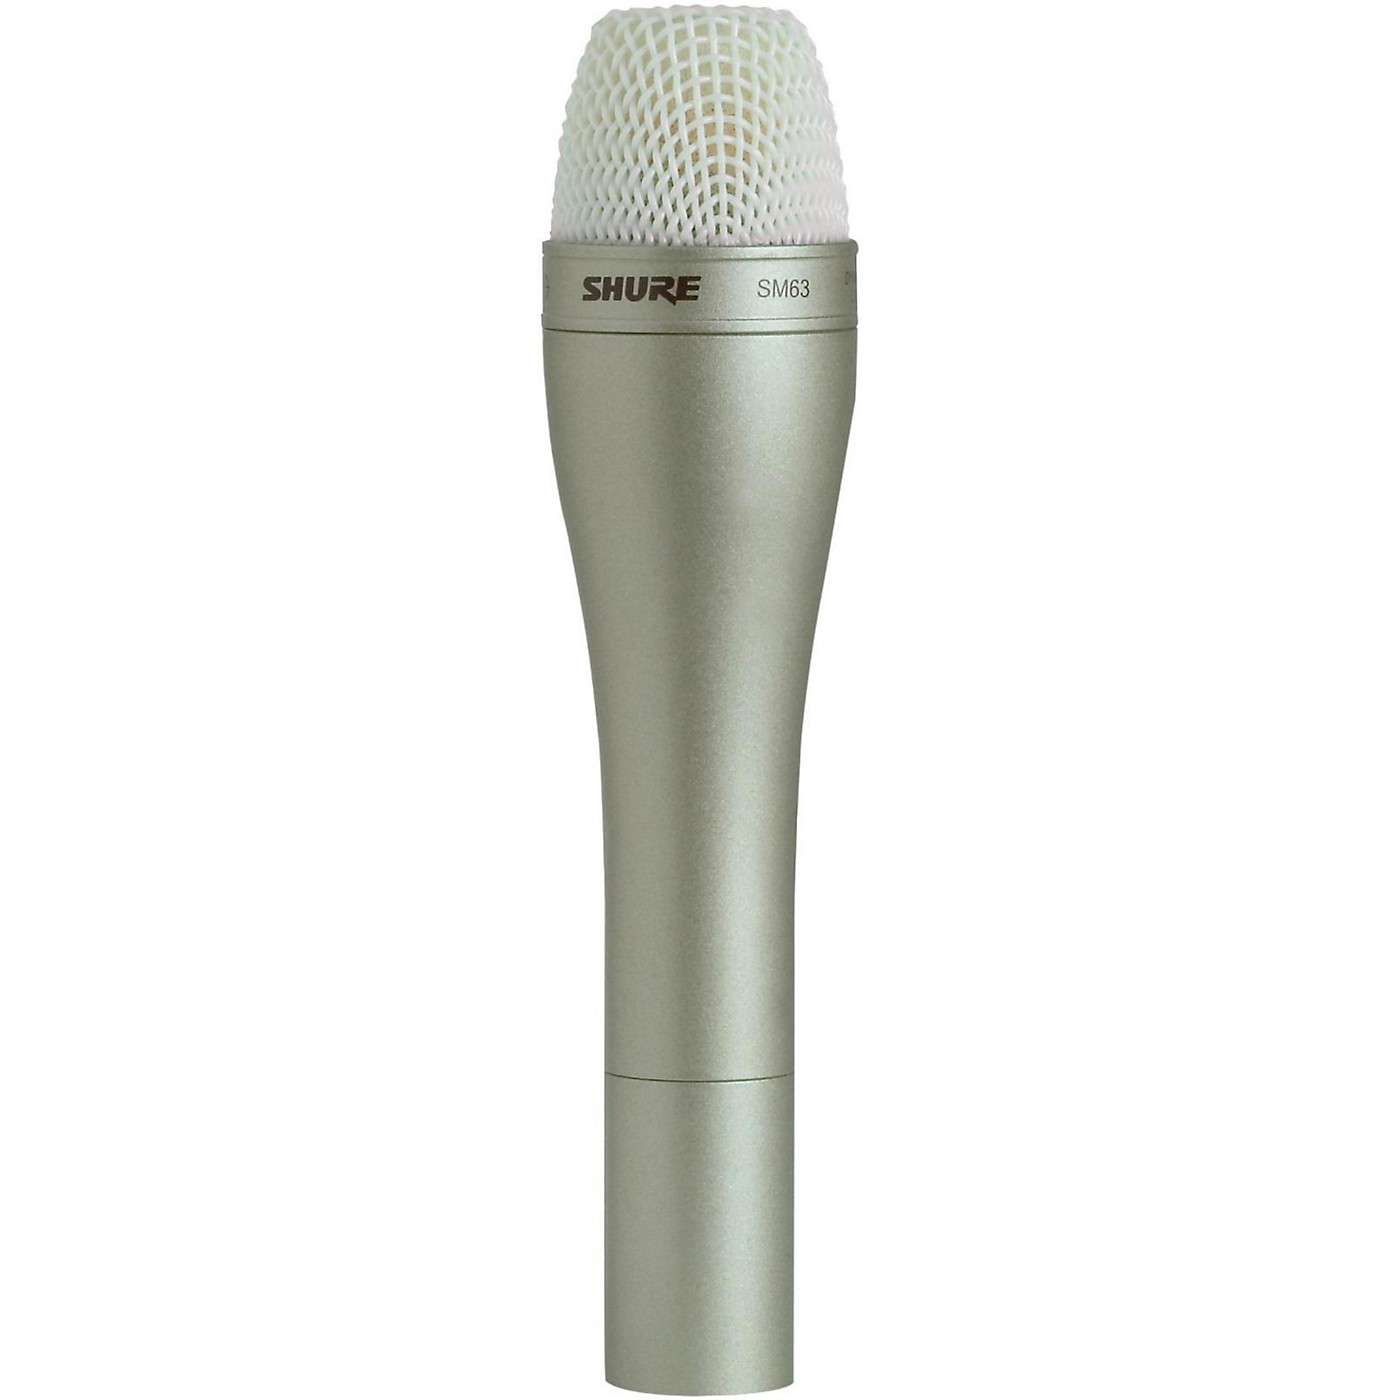 Shure SM63 Handheld Dynamic Omnidirectional Microphone thumbnail